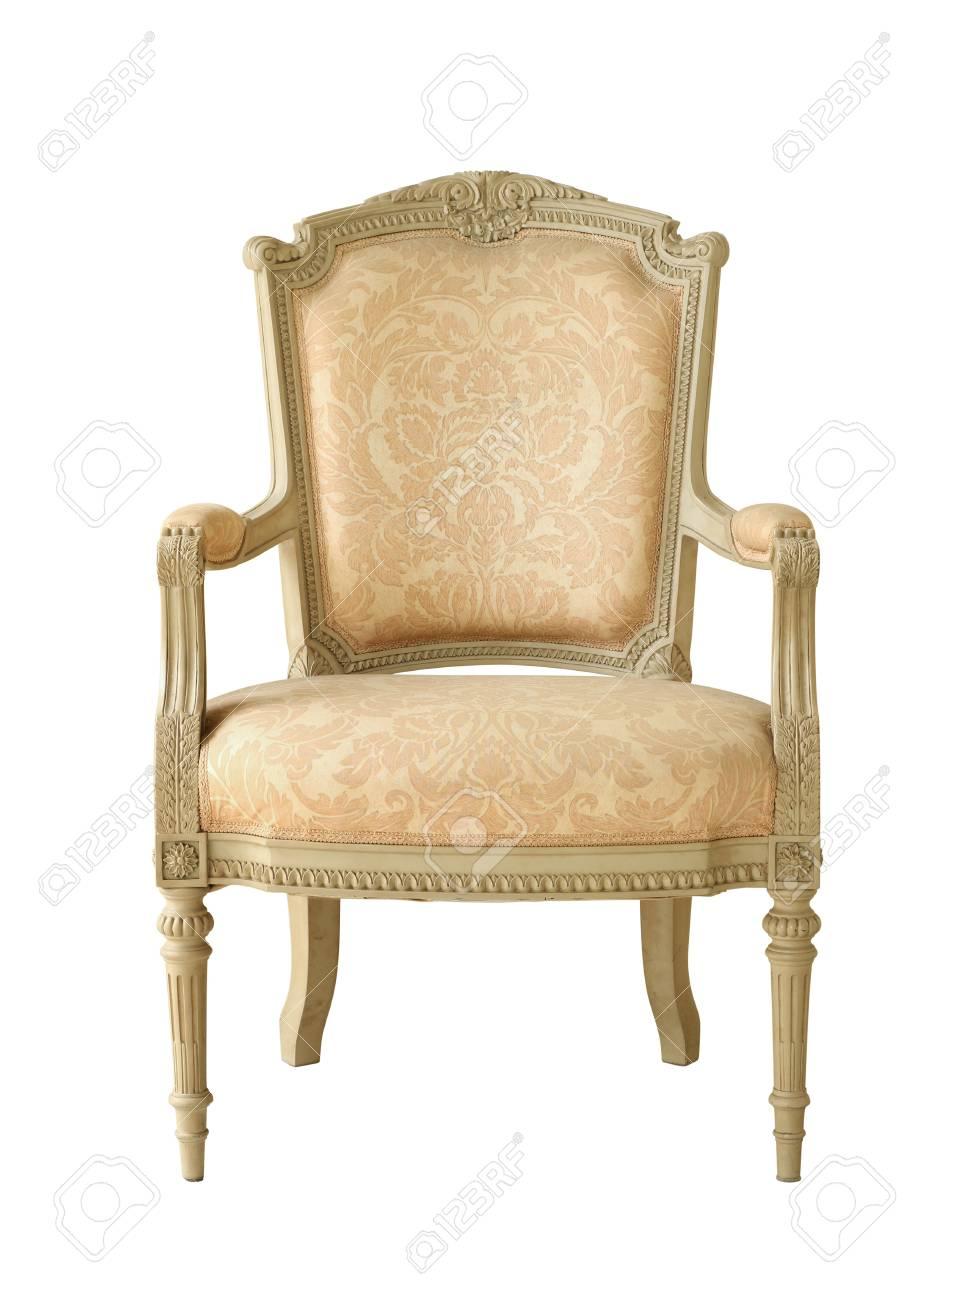 Vintage luxury armchair isolated on white background Stock Photo - 21718794